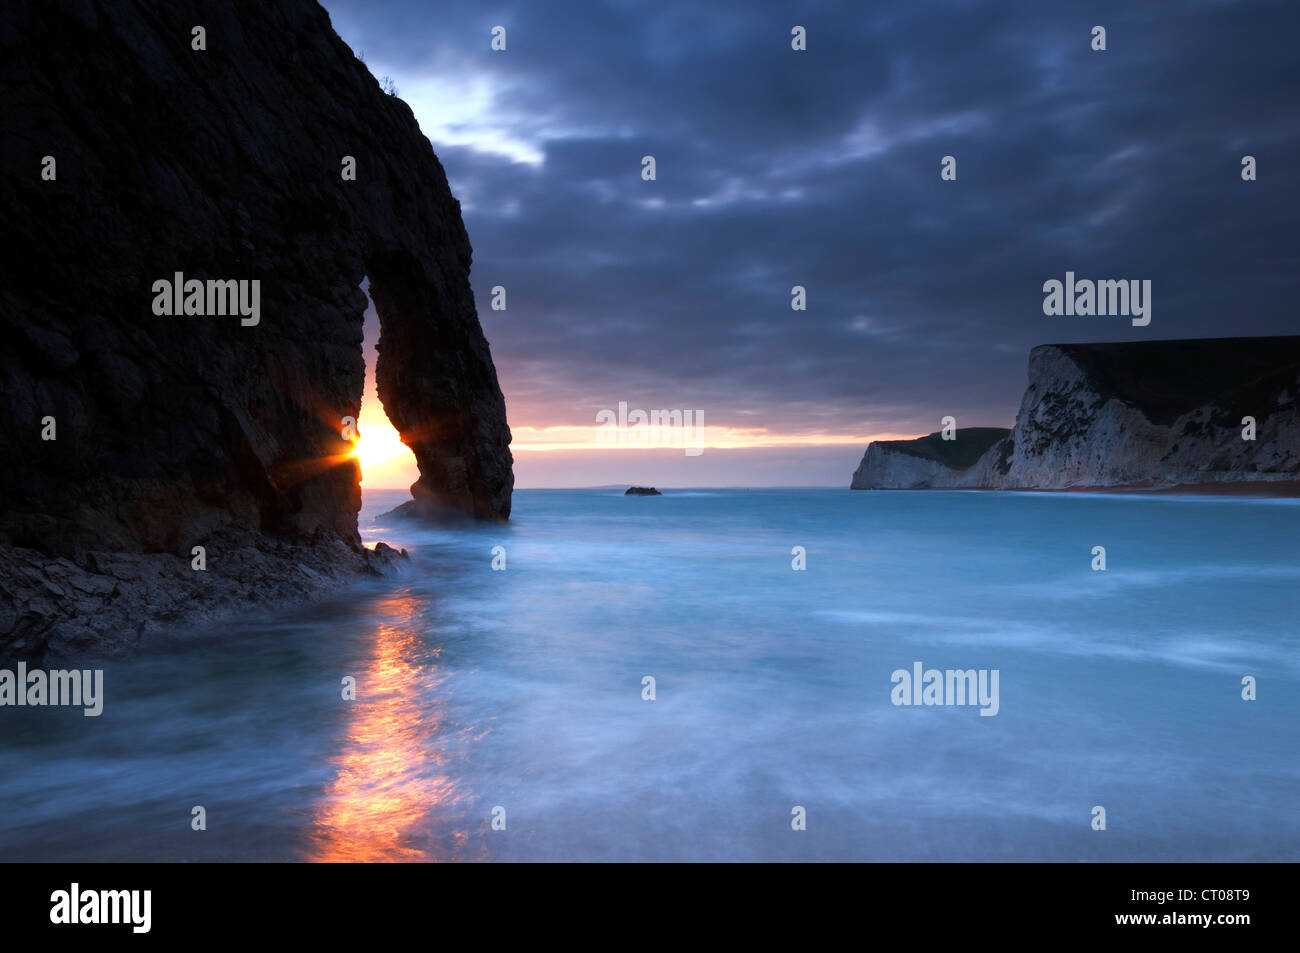 Durdle Door at sunset, Jurassic Coast, Dorset. - Stock Image